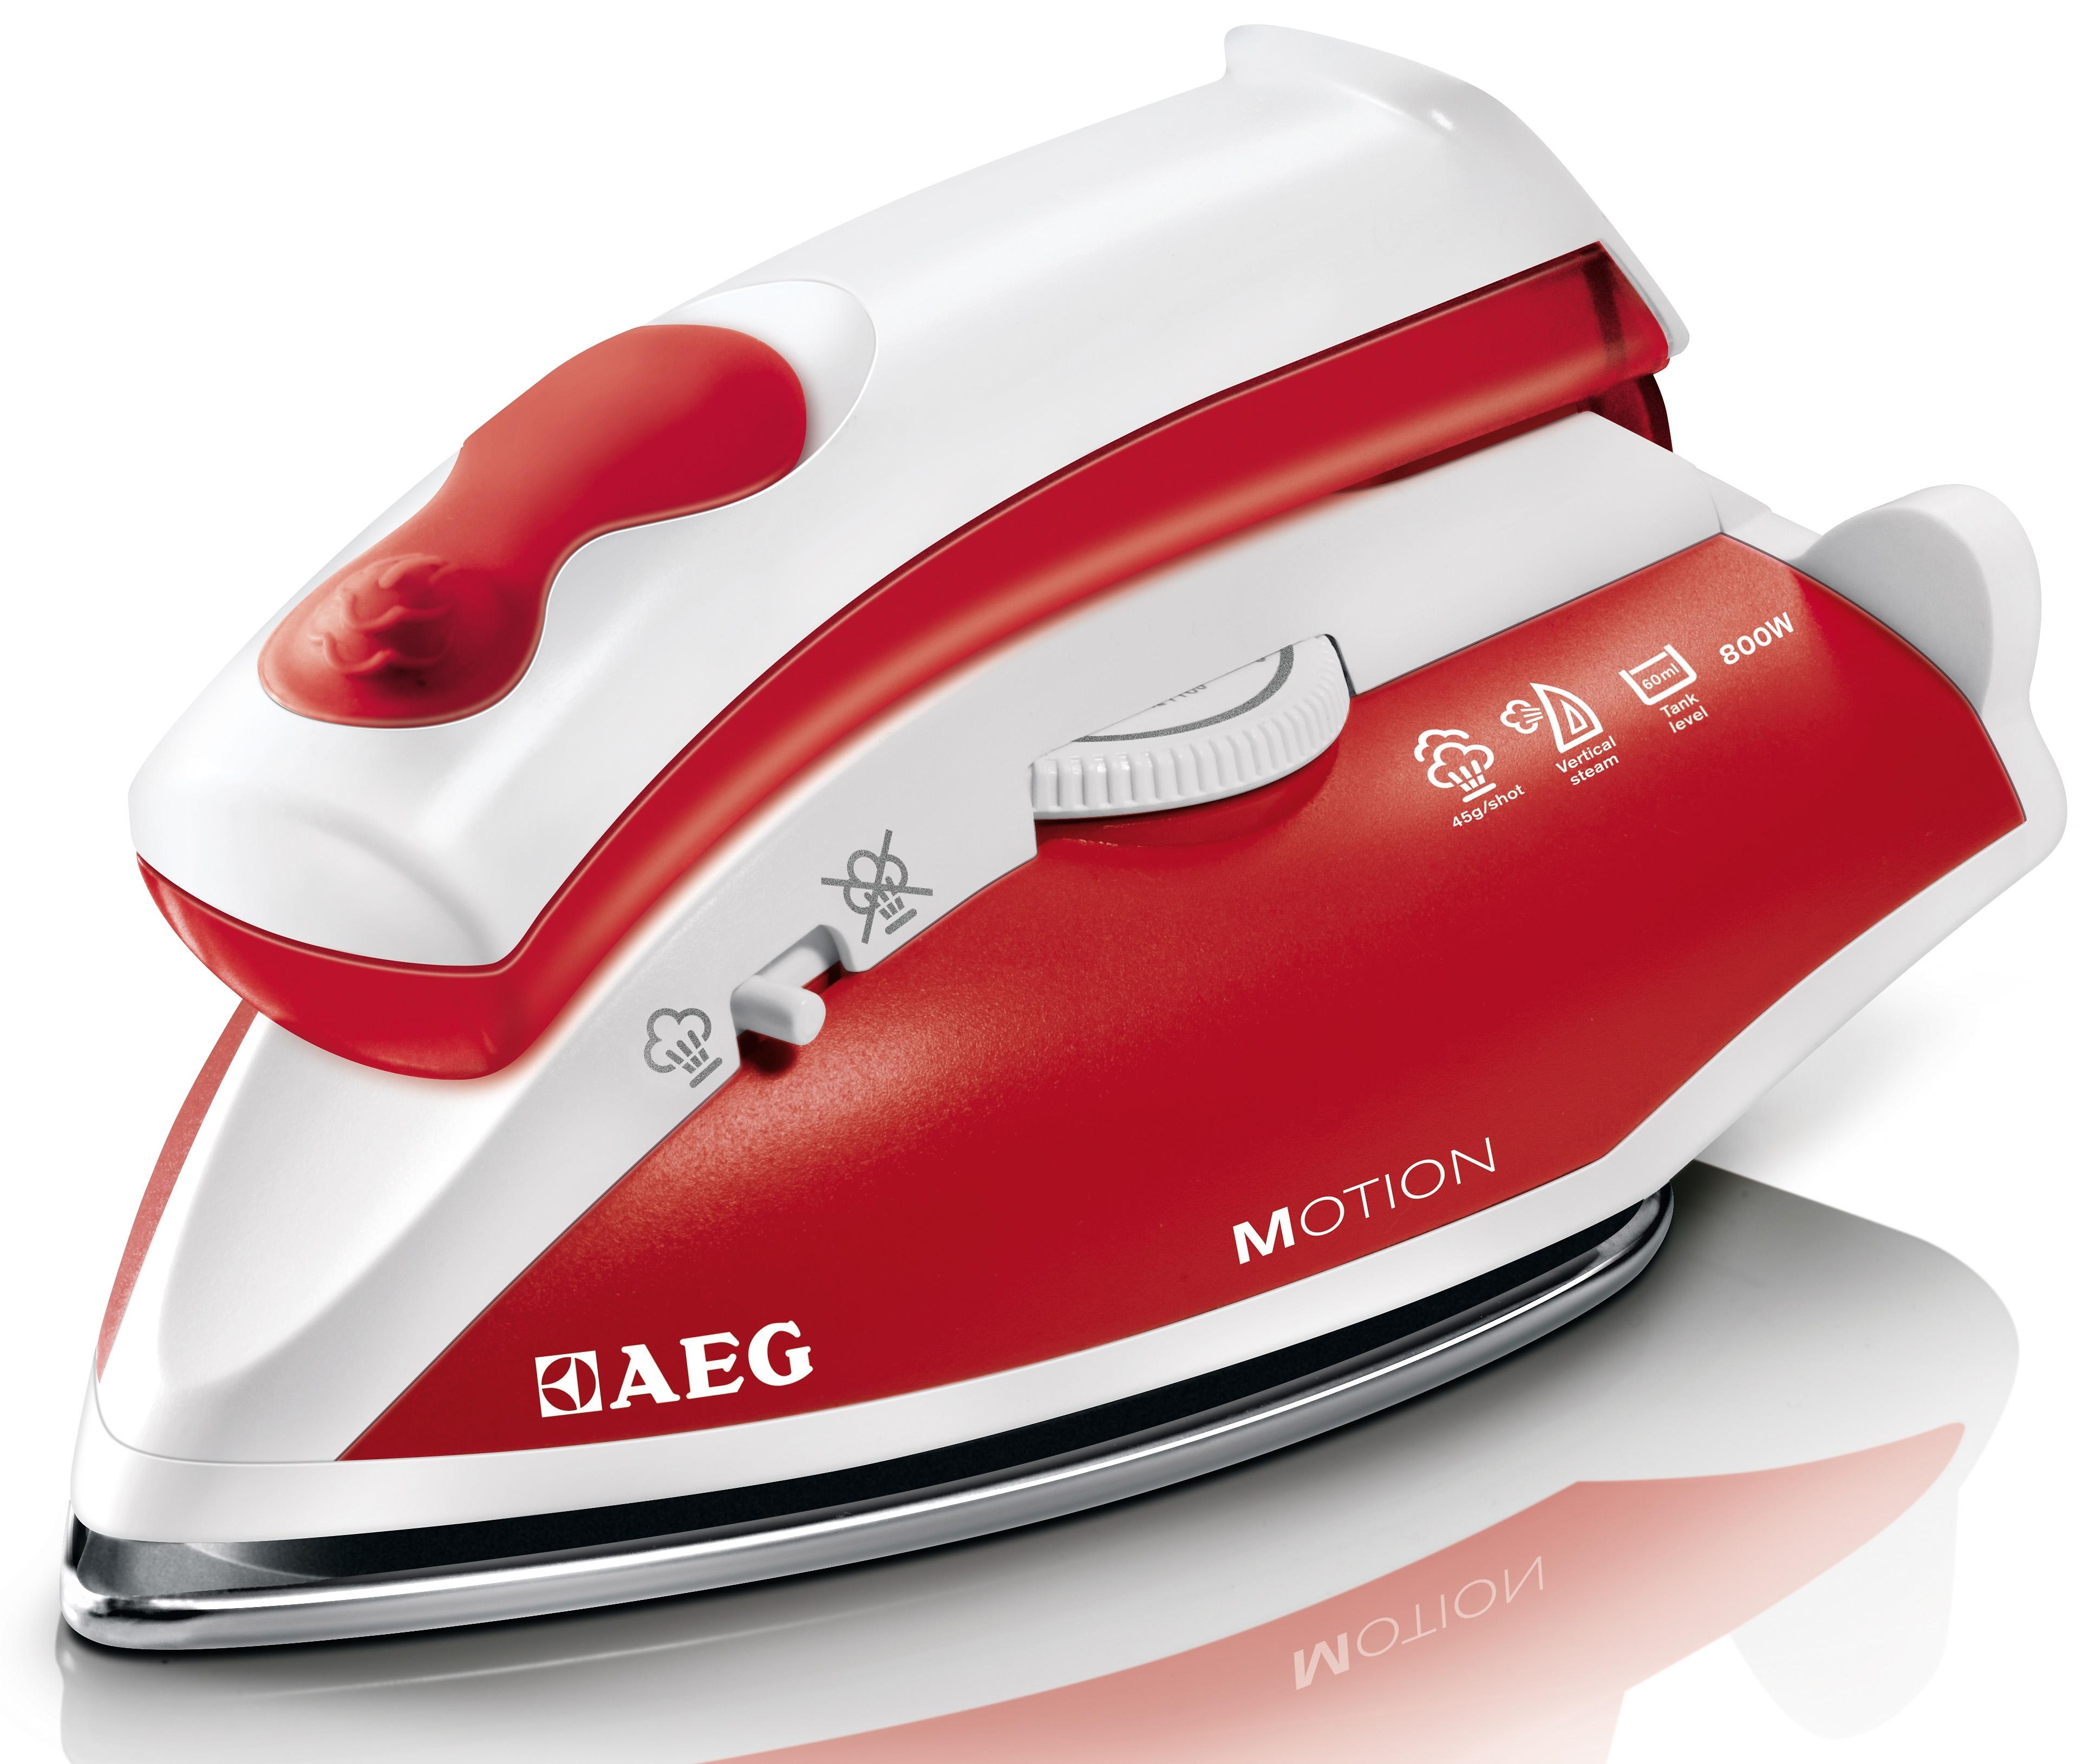 Uitgelezene AEG Reis-strijkijzer DBT 800 snel online gekocht | OTTO DD-06